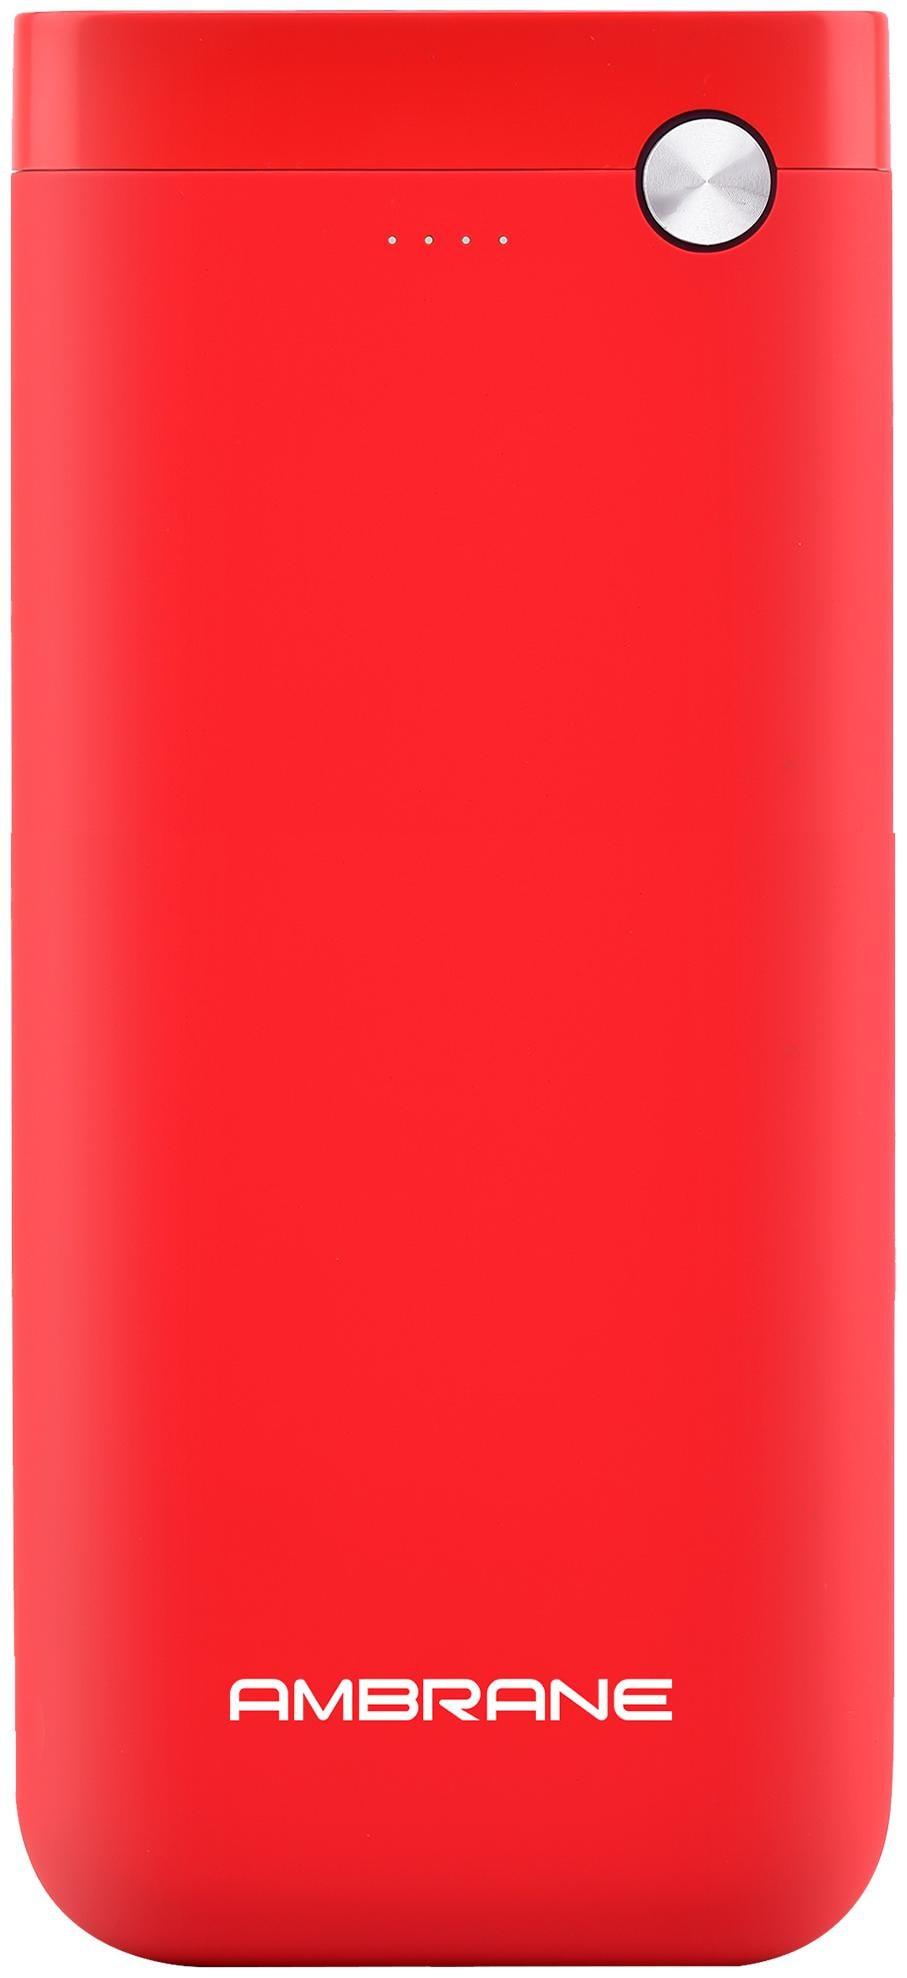 Ambrane PP 20 20000 mAh Power Bank   Red